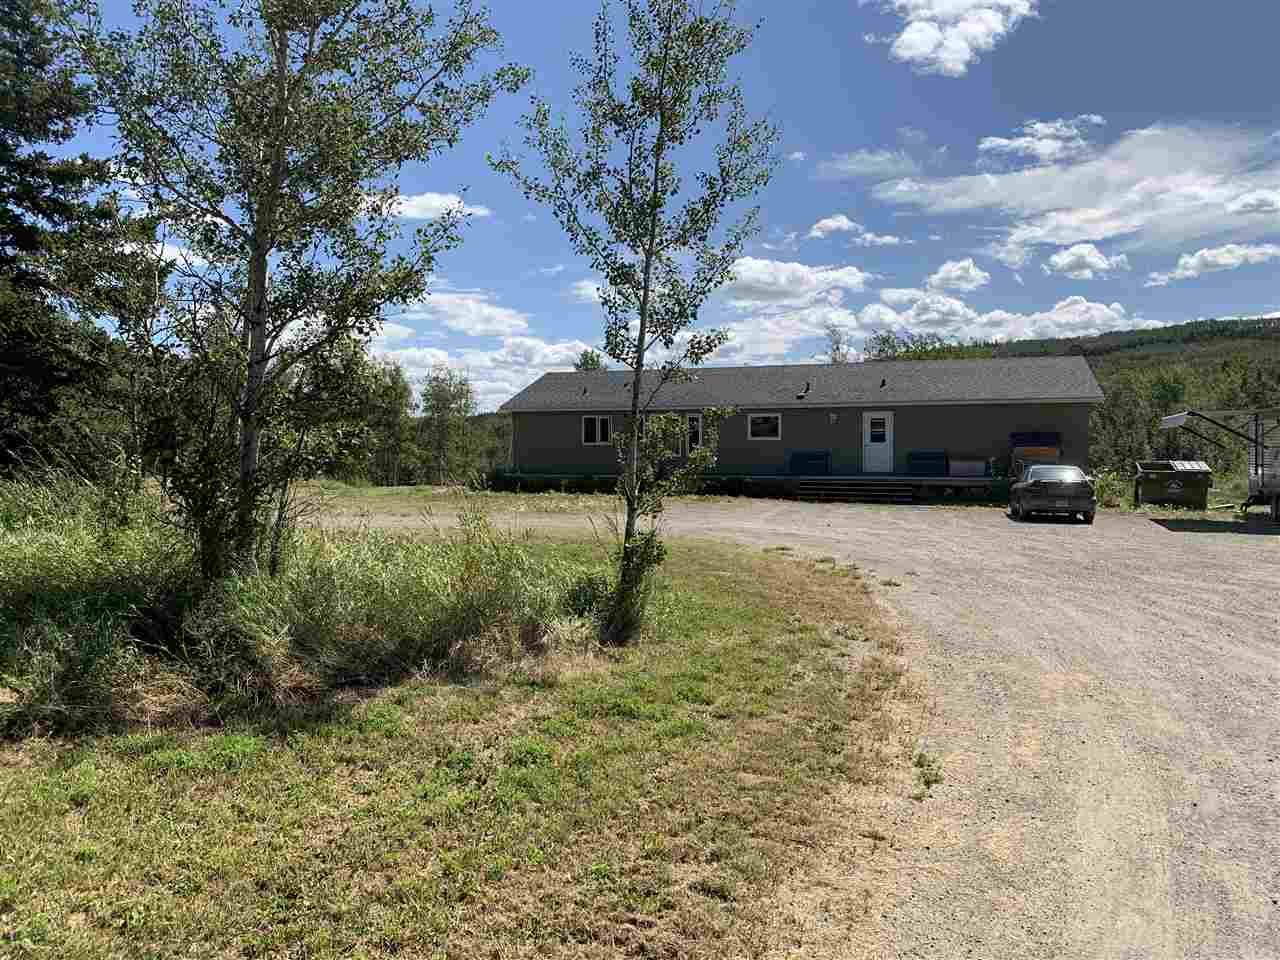 Main Photo: 13534 ROSE PRAIRIE Road in Fort St. John: Fort St. John - Rural W 100th Manufactured Home for sale (Fort St. John (Zone 60))  : MLS®# R2481448